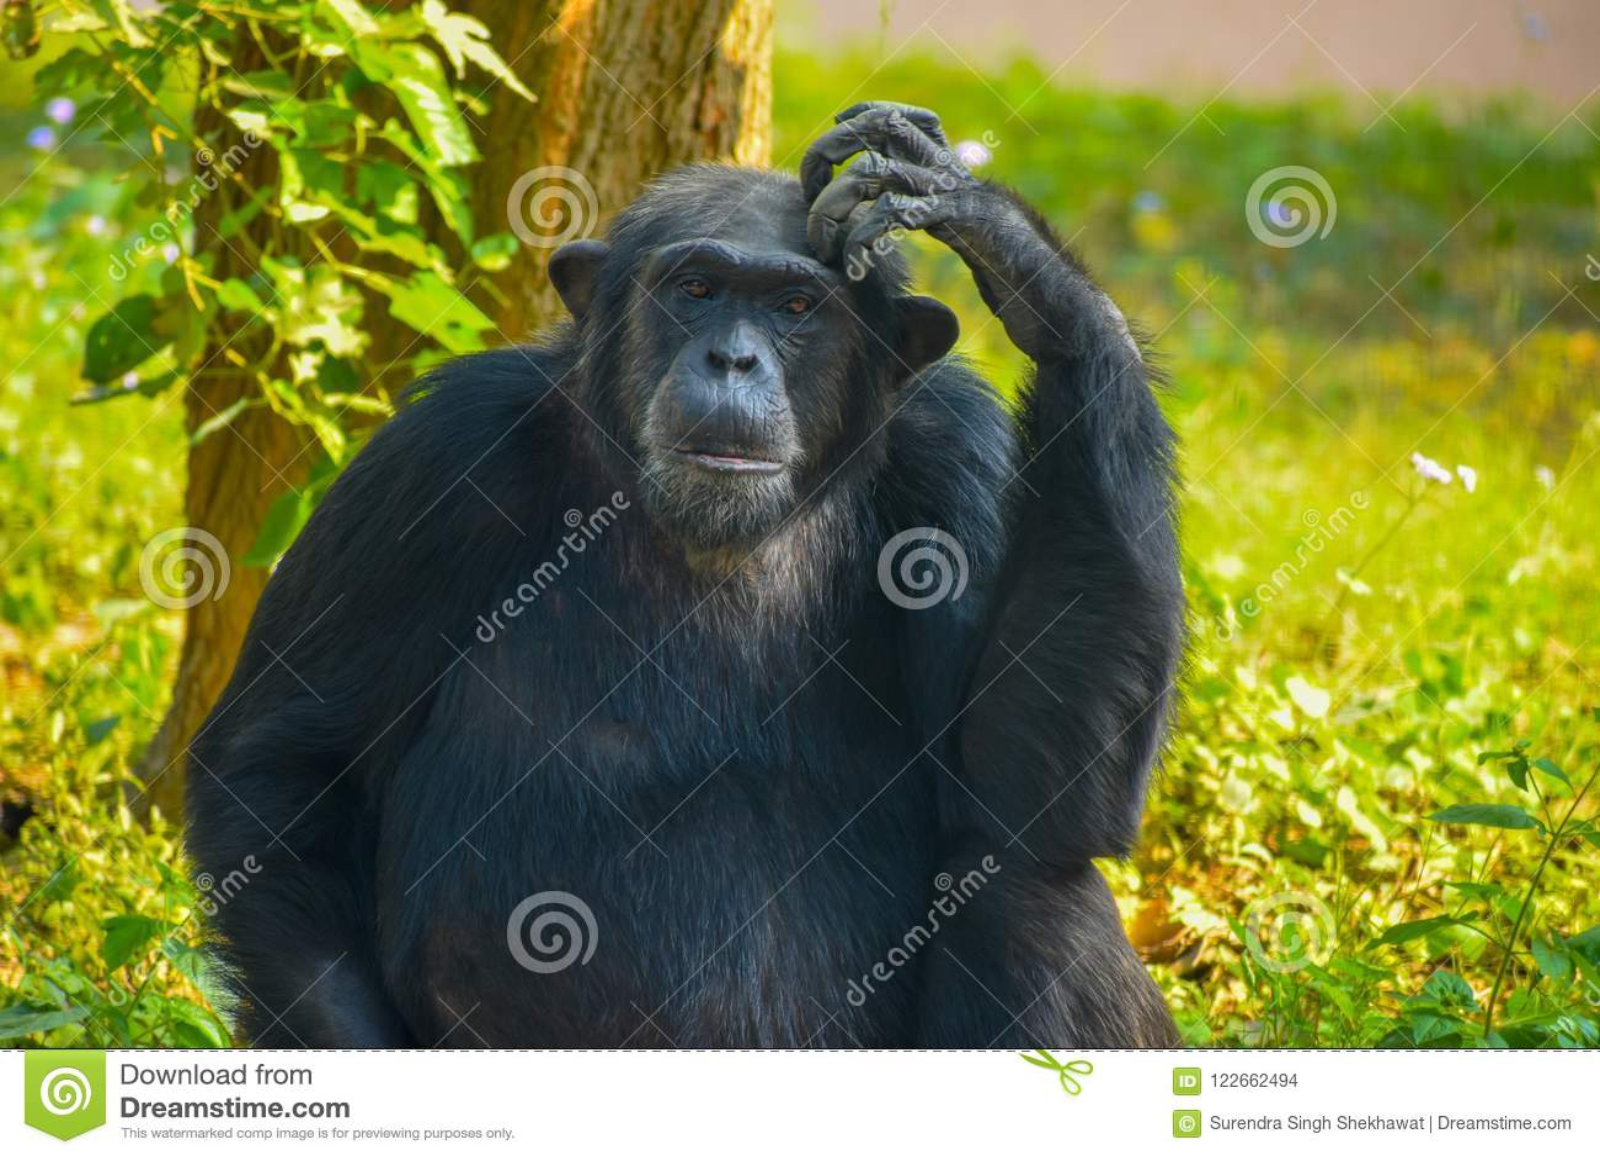 Chimpanzee sitting and thinking about something